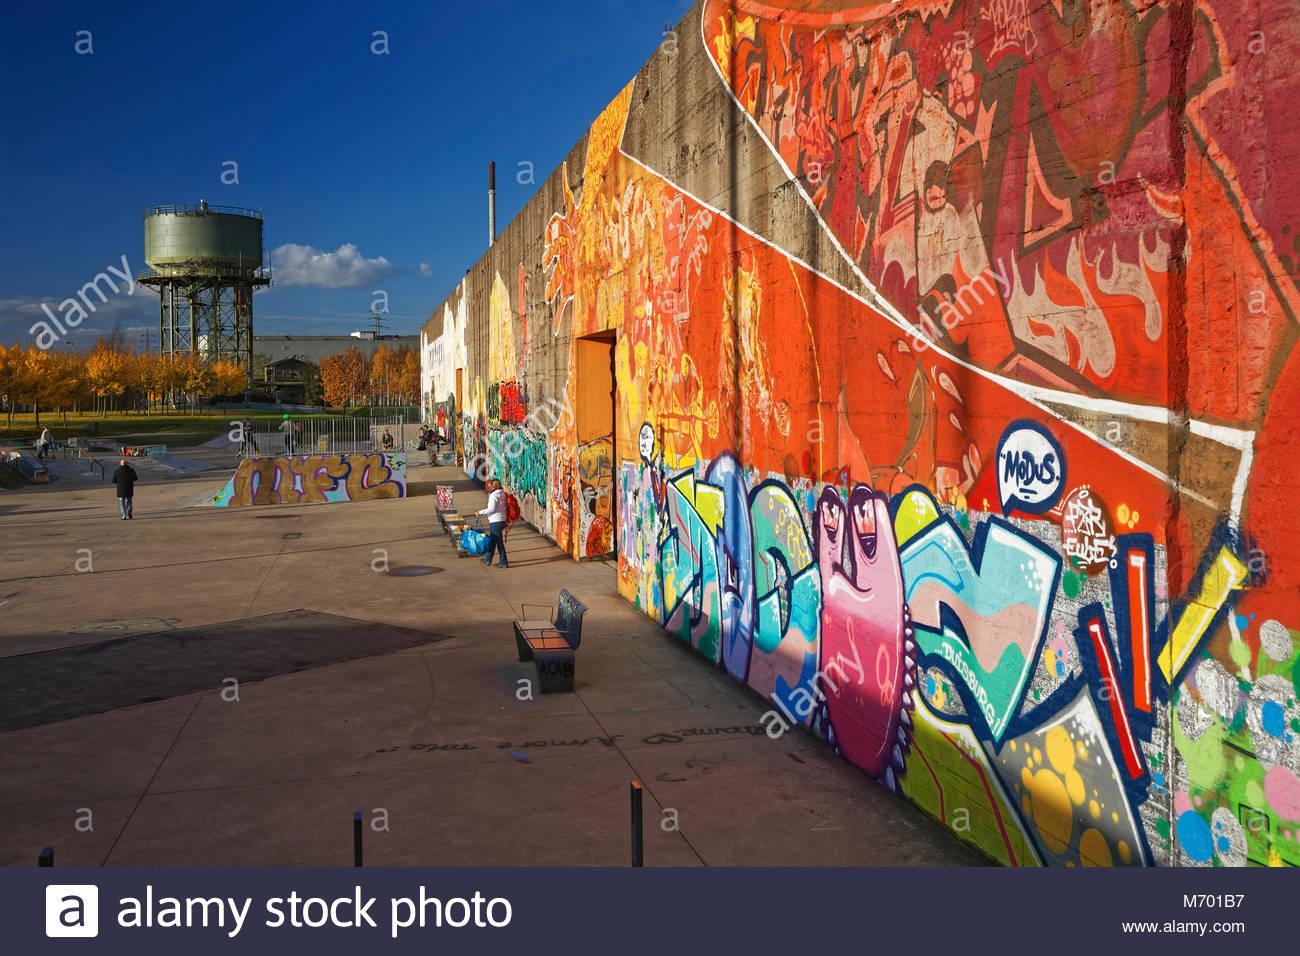 Graffiti Duisburg skatepark skateboarding sport concrete wall graffiti colourful